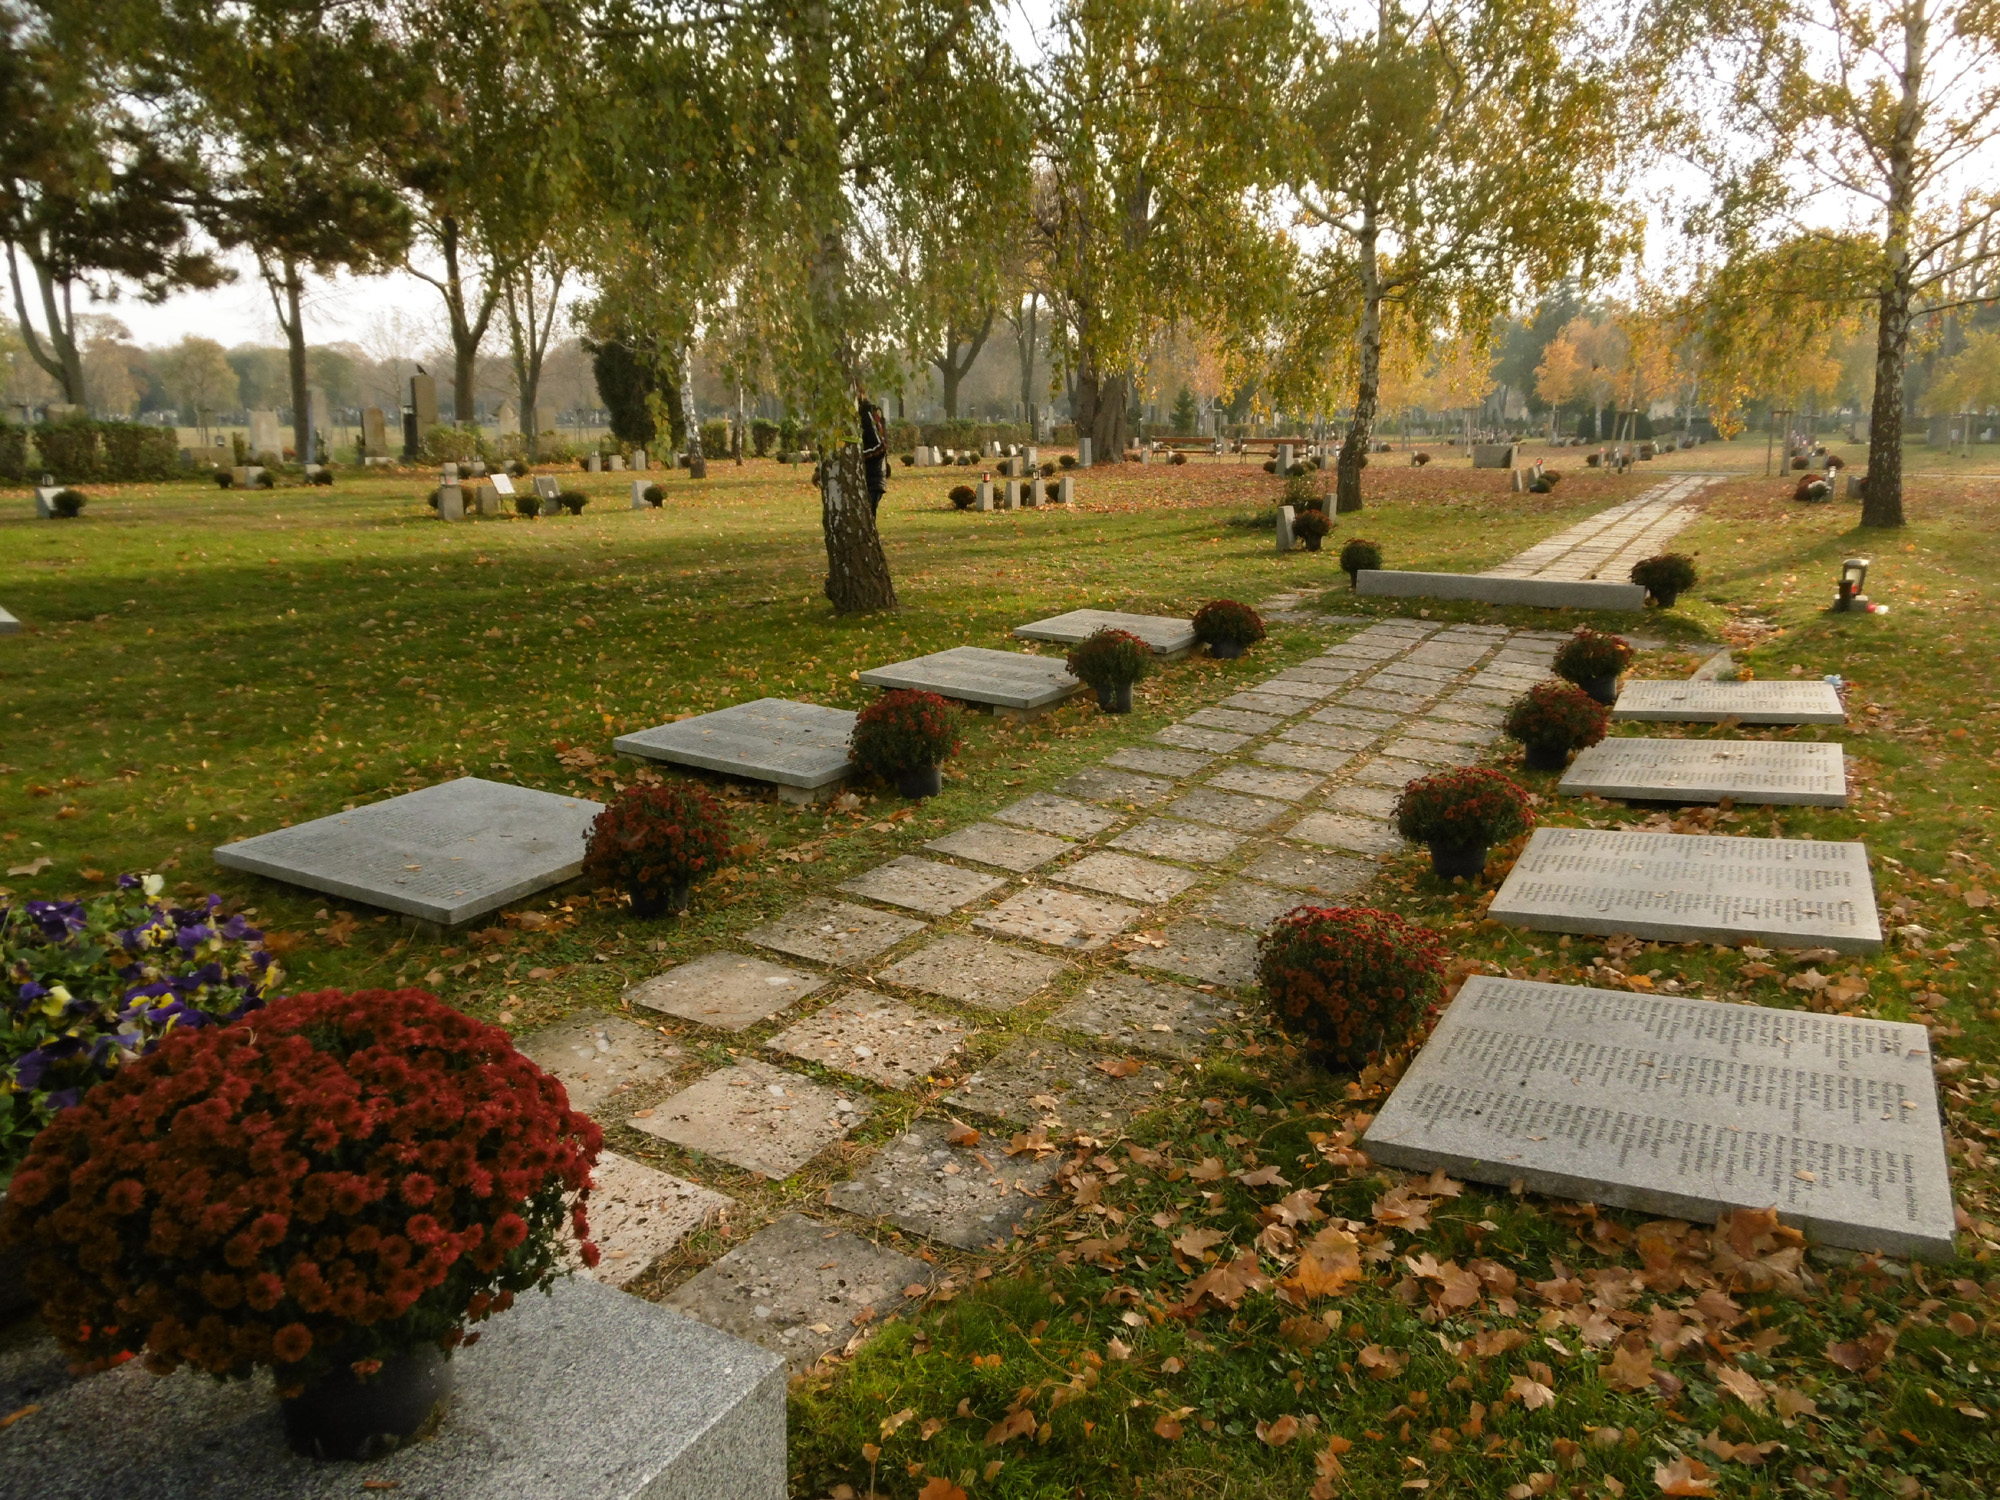 spiegelgrund opfergr ber zentralfriedhof. Black Bedroom Furniture Sets. Home Design Ideas